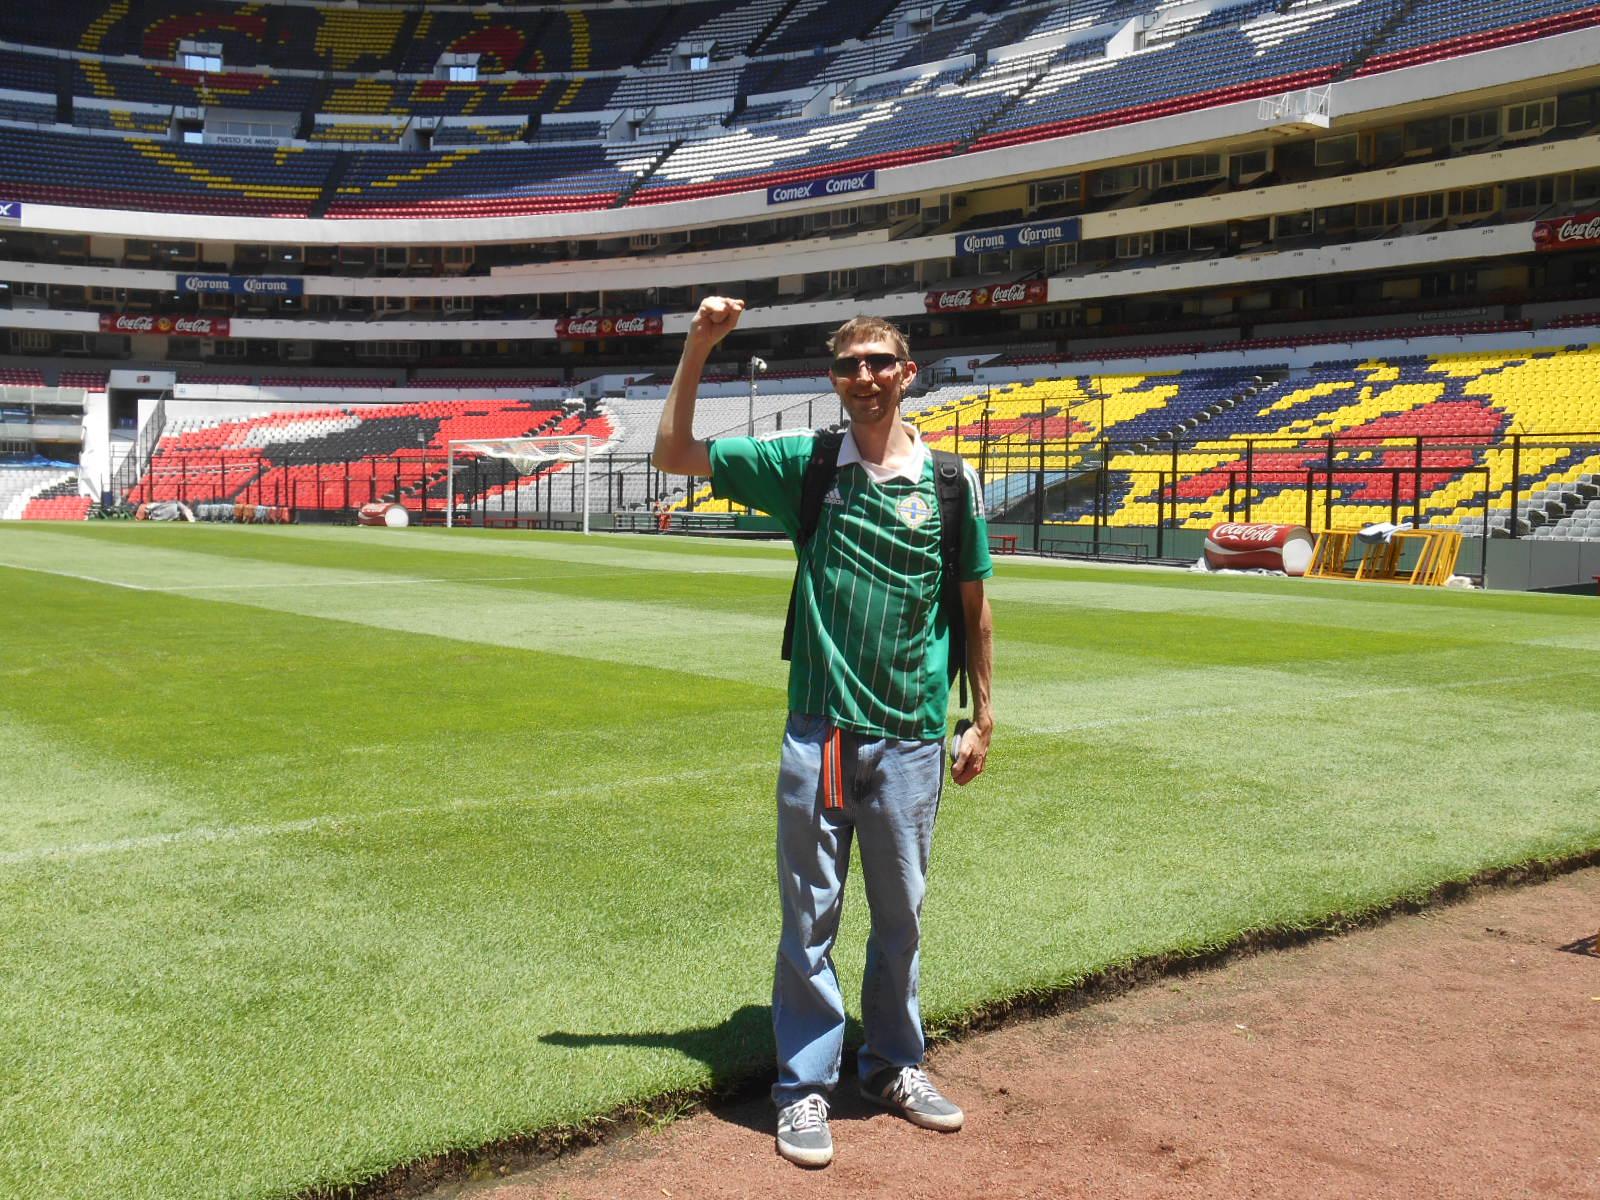 Doing the Maradona at the Hand of God end! Mexico City.